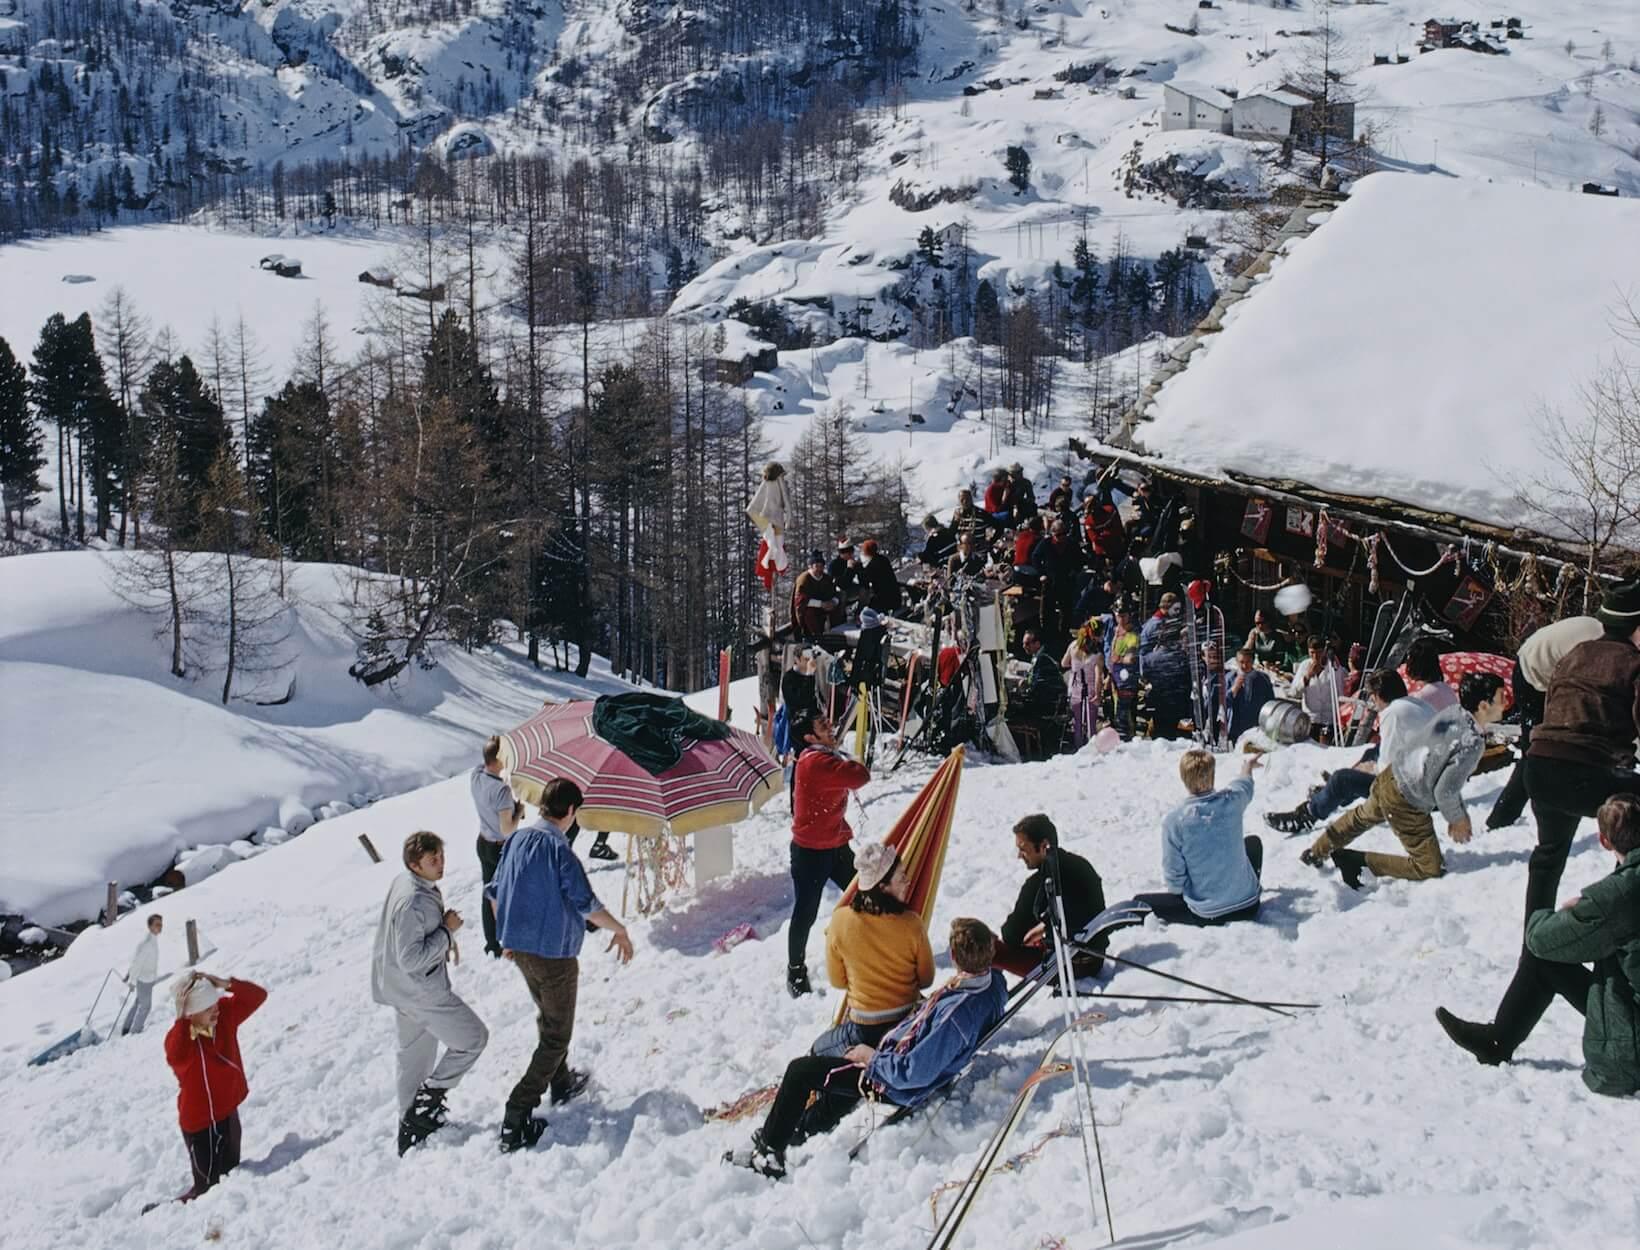 Three Après-Ski Looks for Your Winter Break